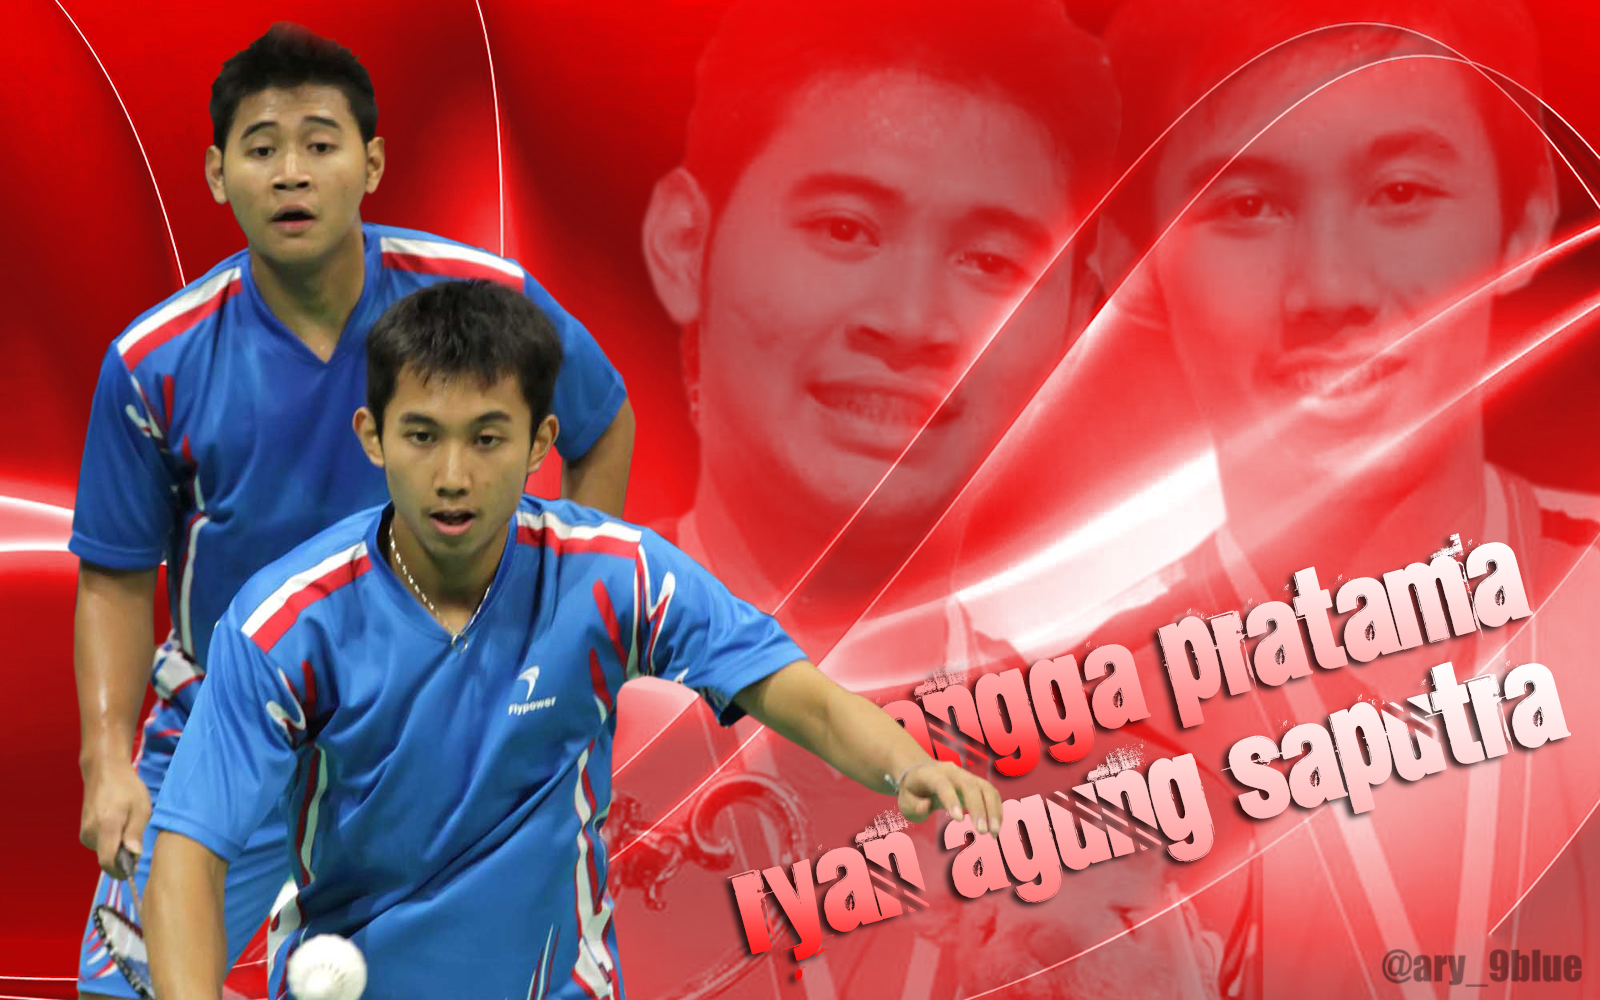 Wallpaper Angga Pratama Ryan Agung Saputra